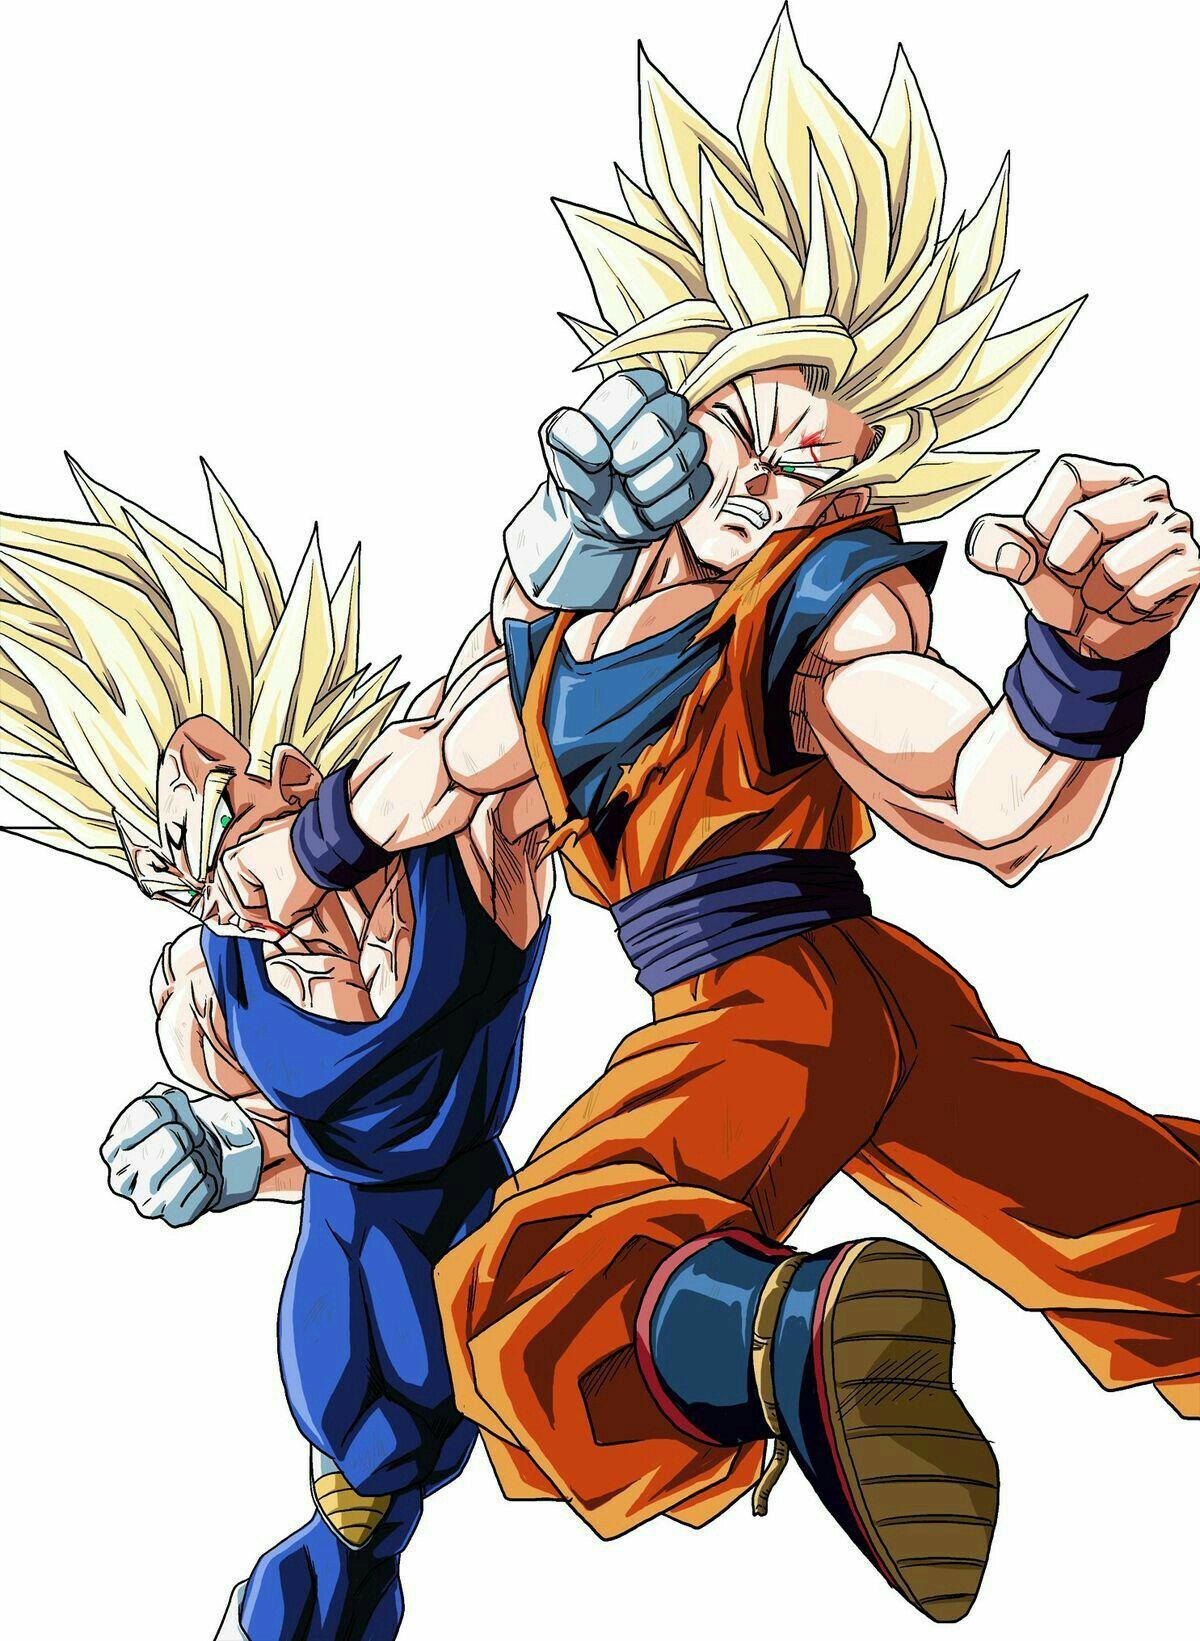 Goku vs. Majin Vegeta - Dragon ball z | Dbz | Dragon ball ...